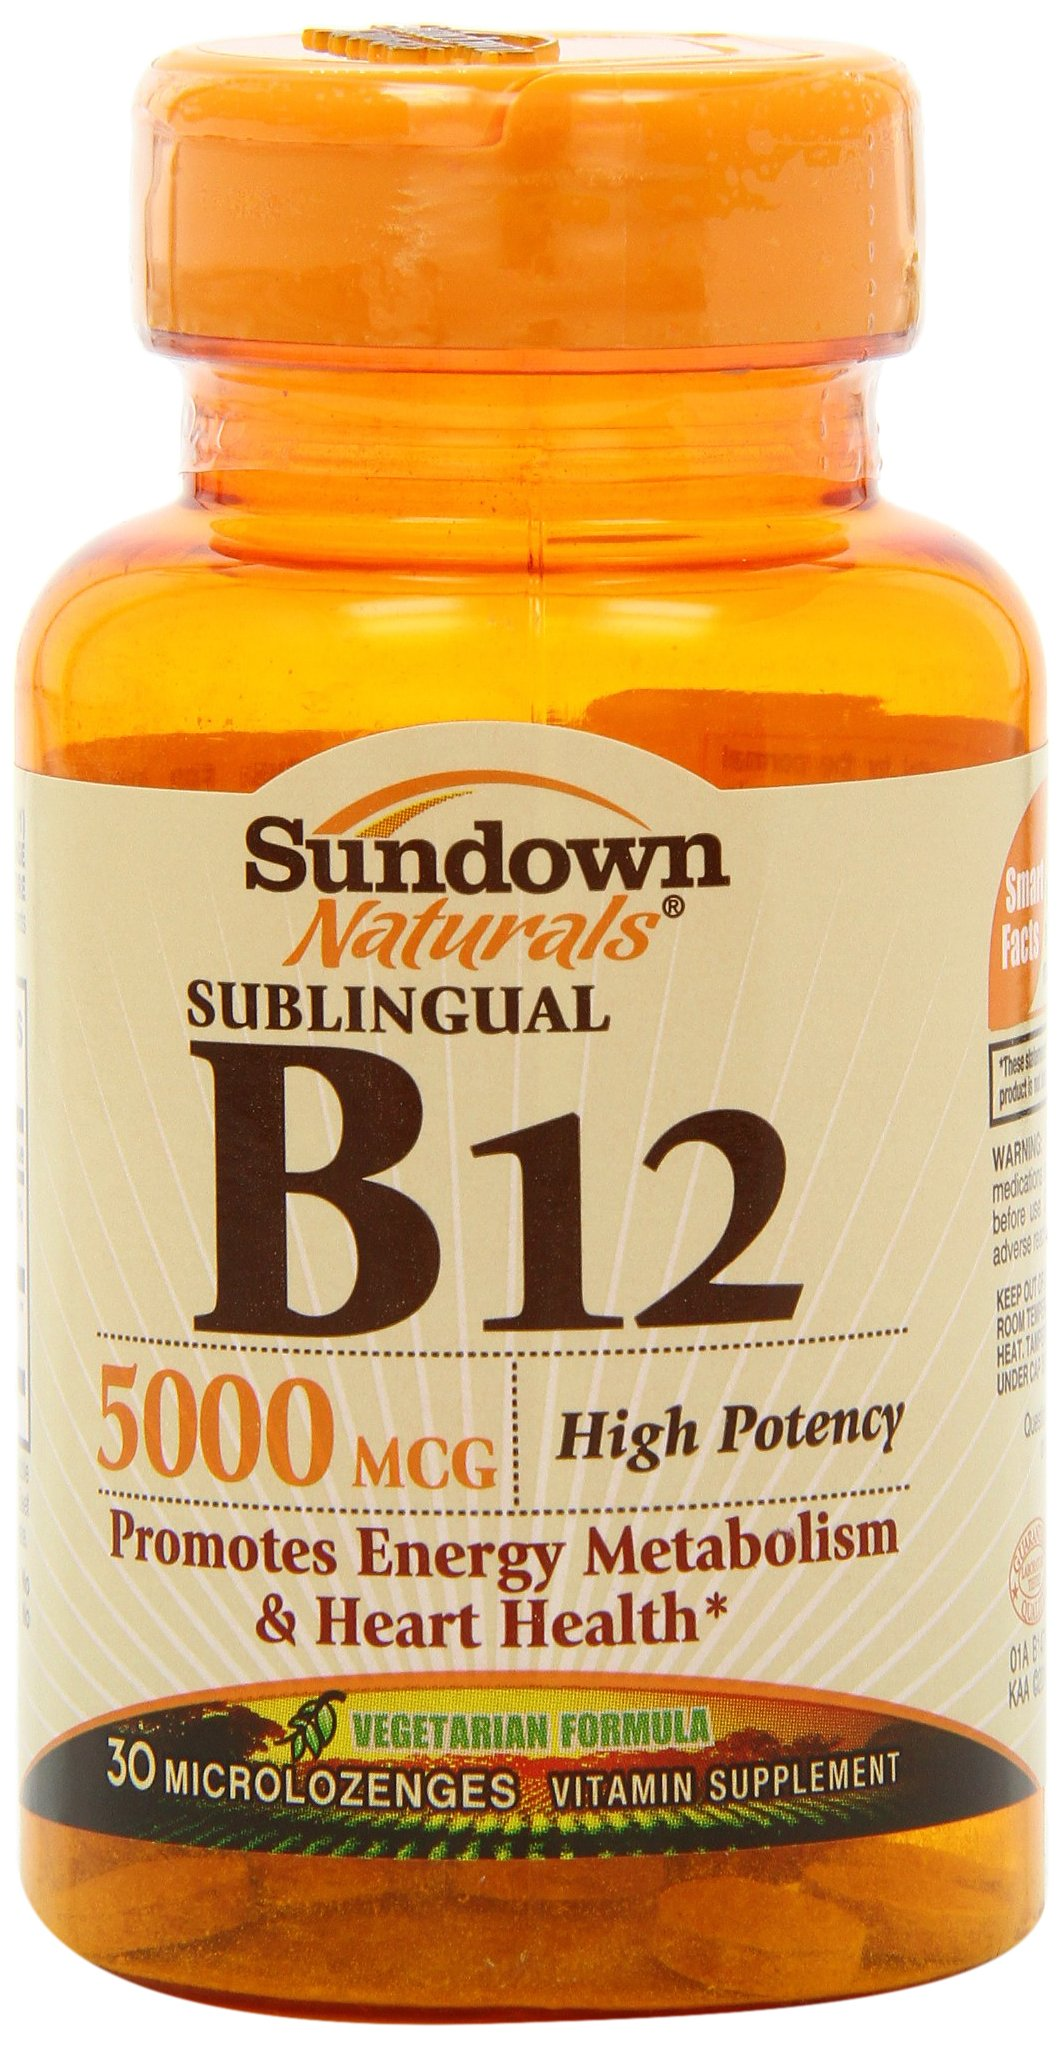 Sundown Naturals High Potency Sublingual B12, 5000 mcg, 30 Tablets (Pack of 3)